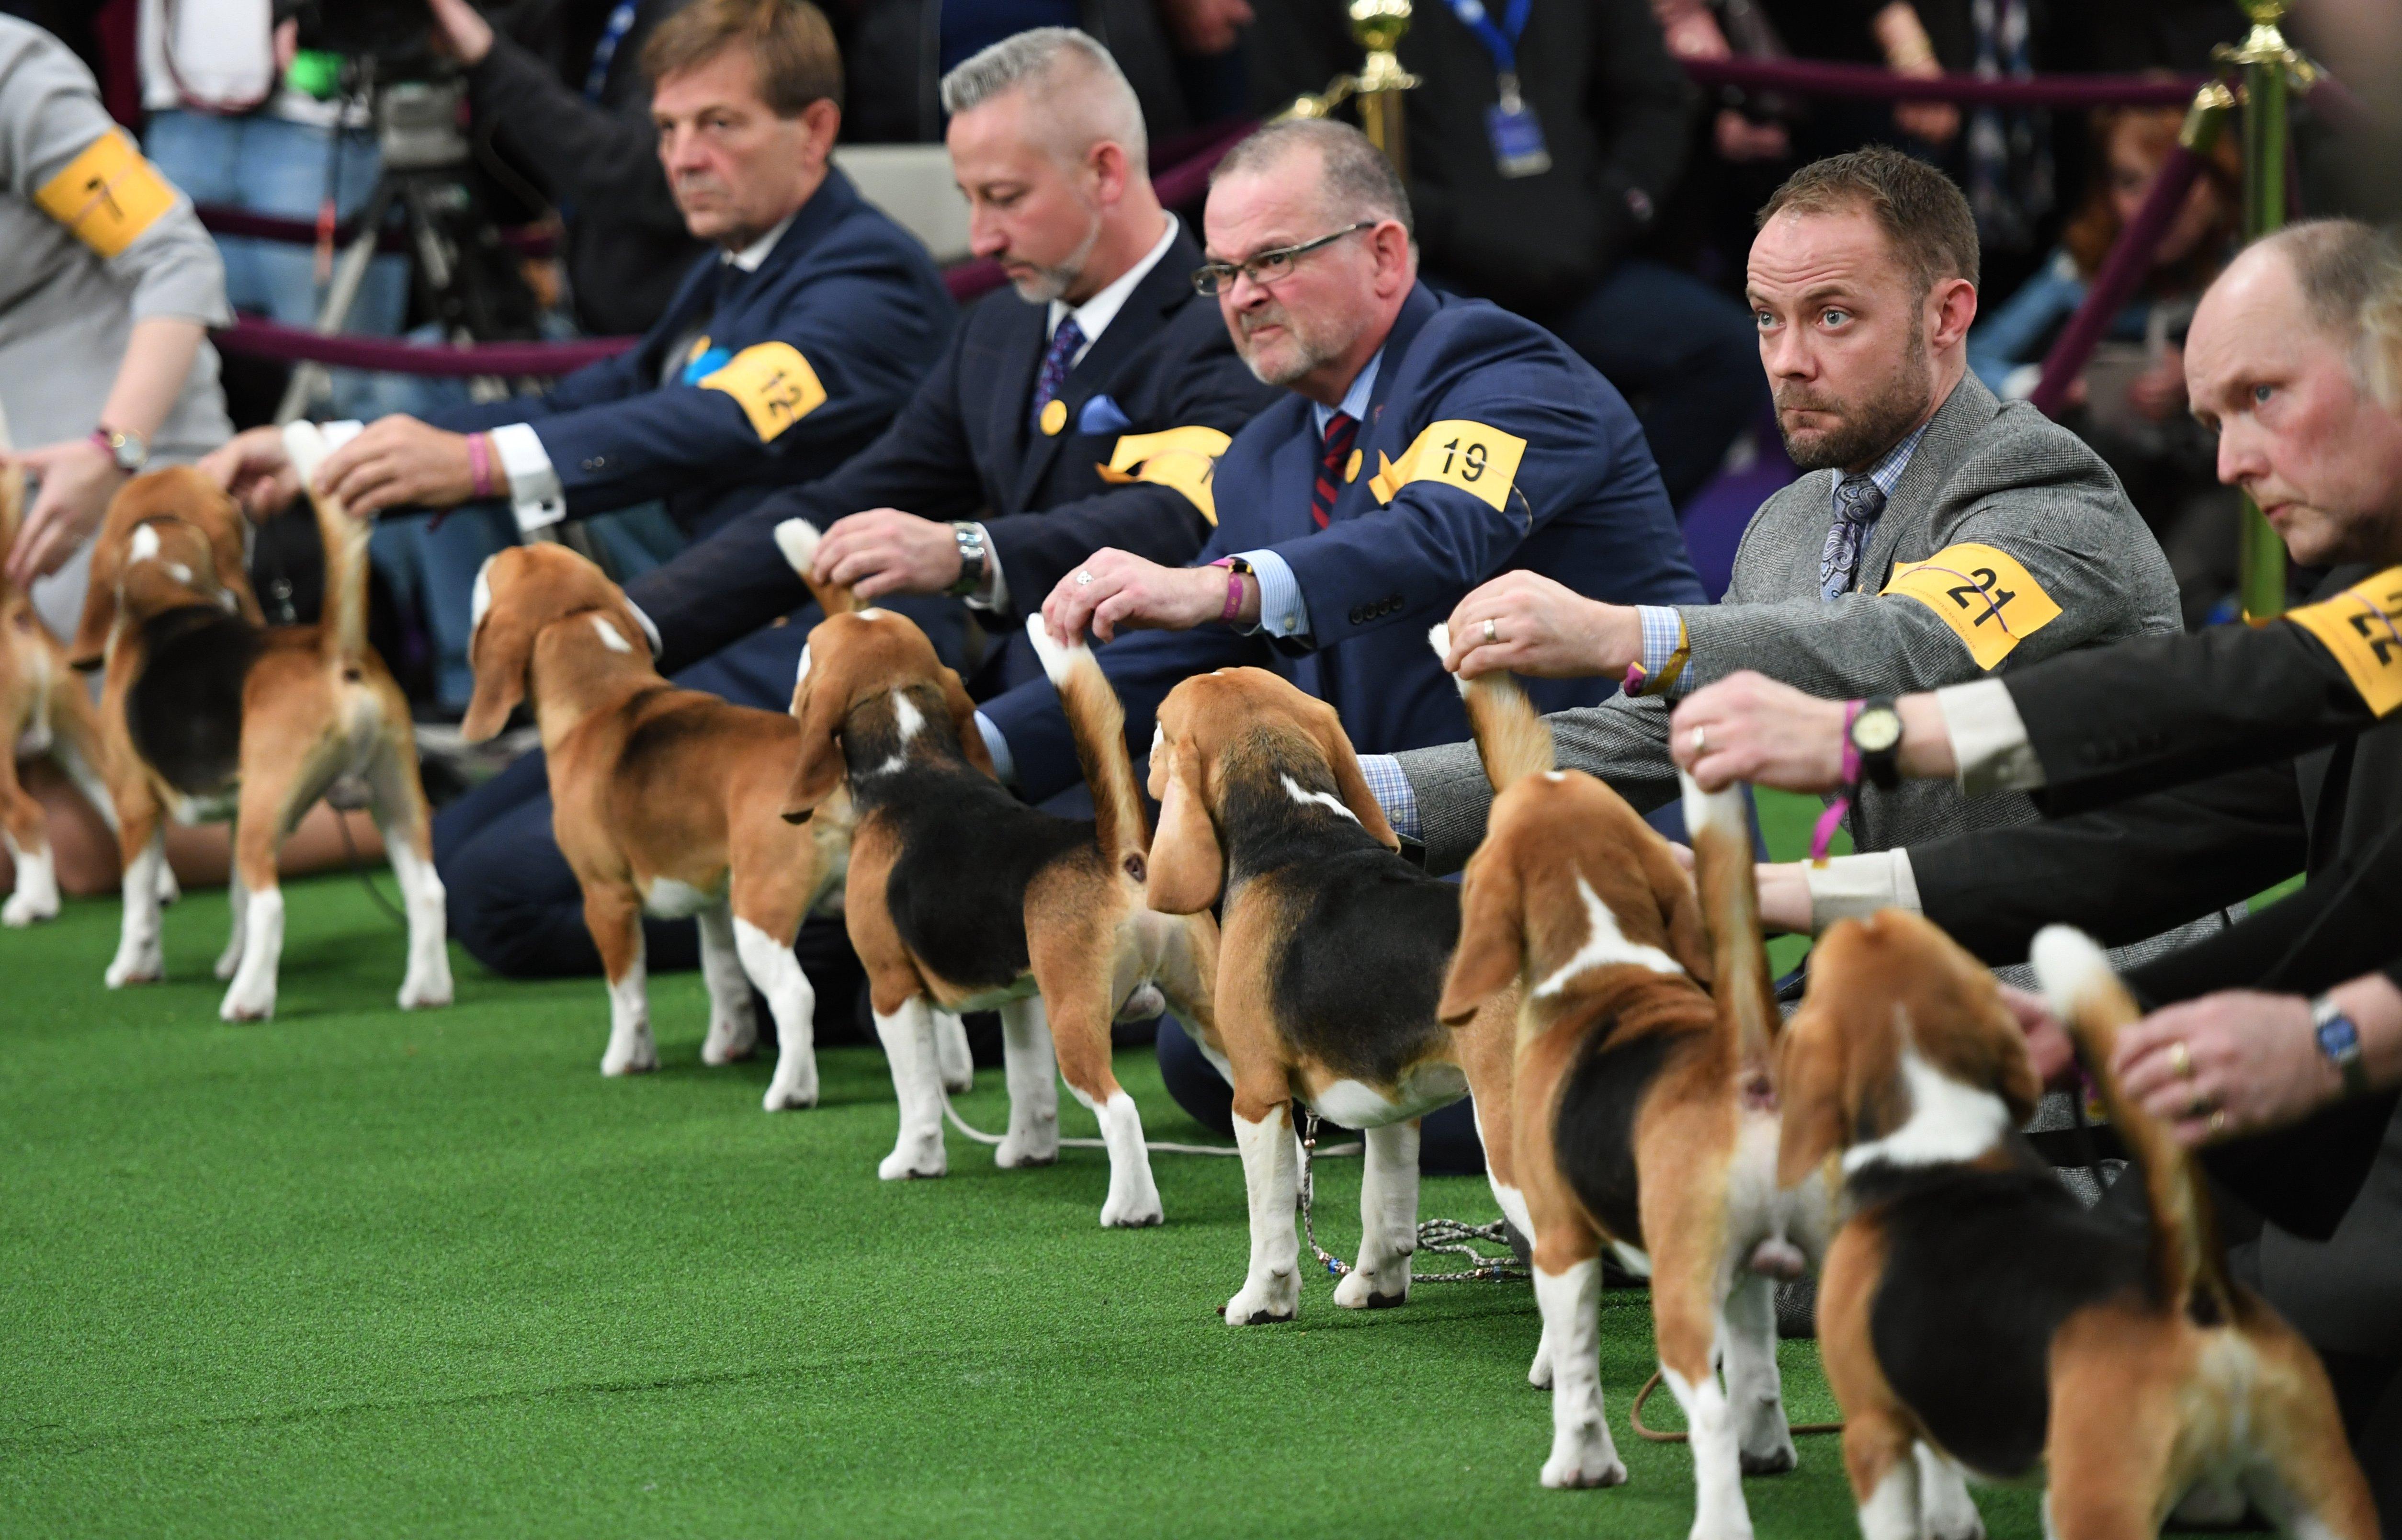 Westminster Dog Show Lineup